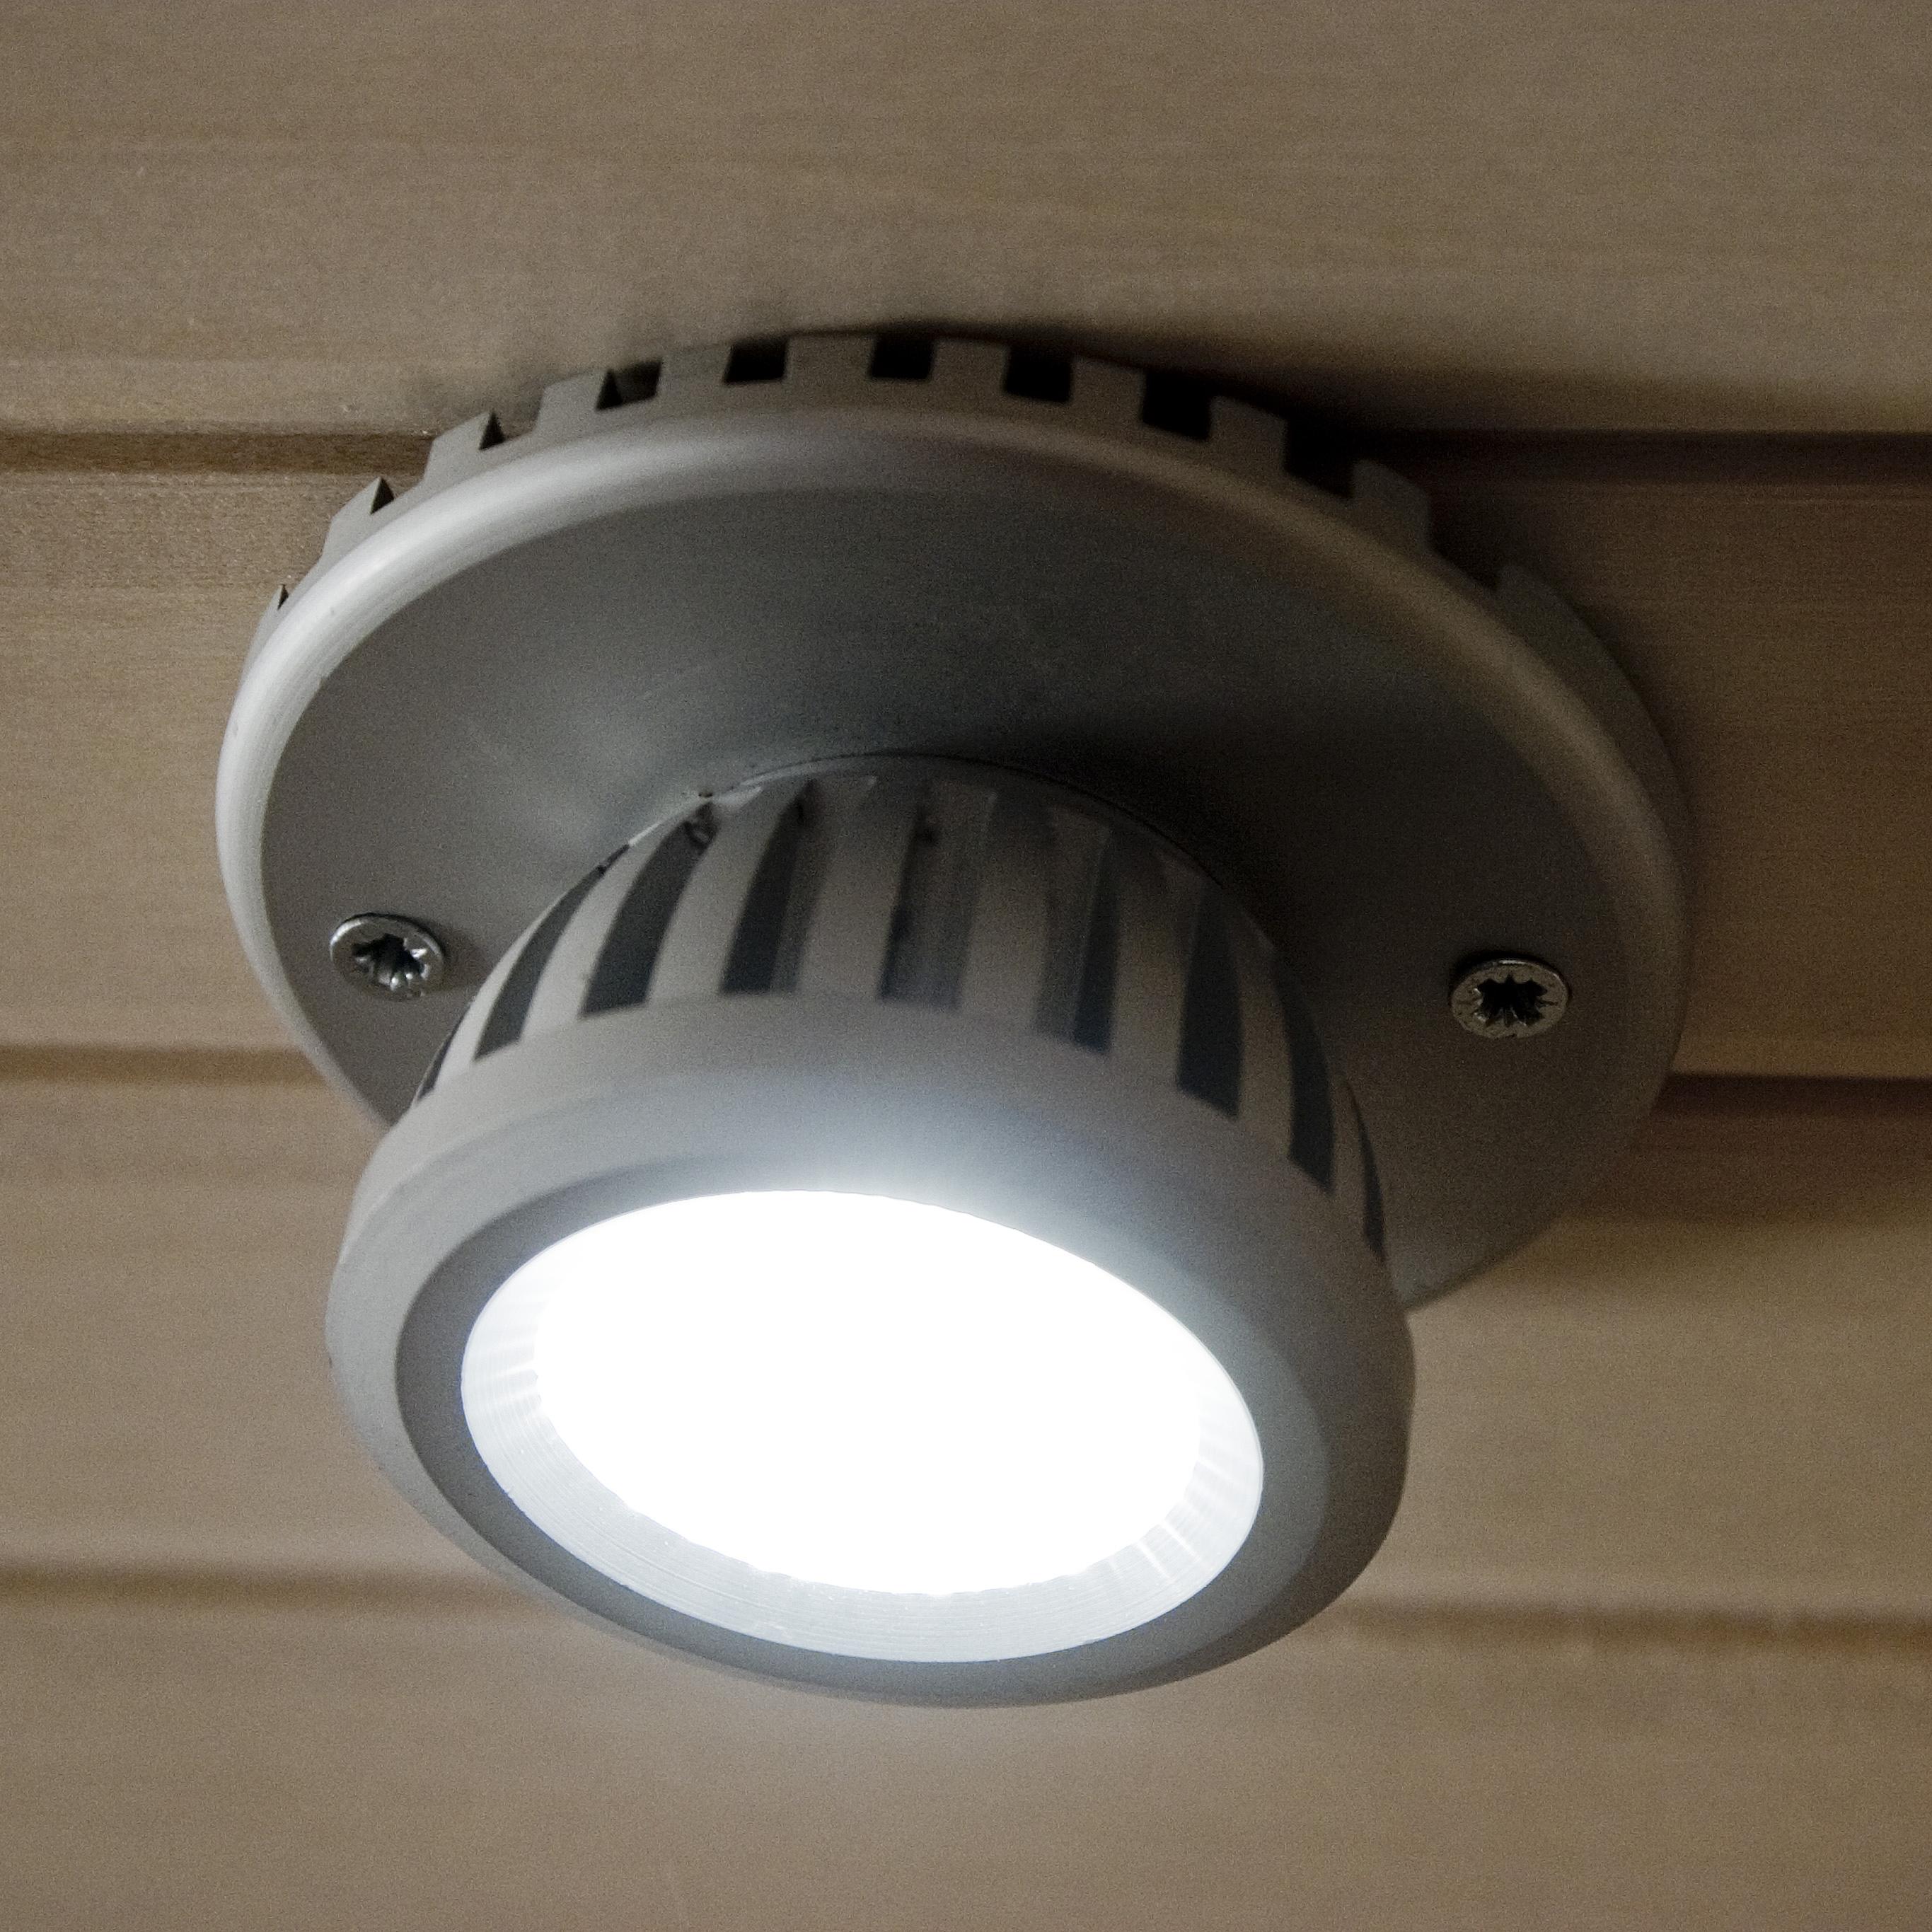 Iluminare pe baza de led pentru saune traditionale - Putere 3 kW -2 TYLO - Poza 6